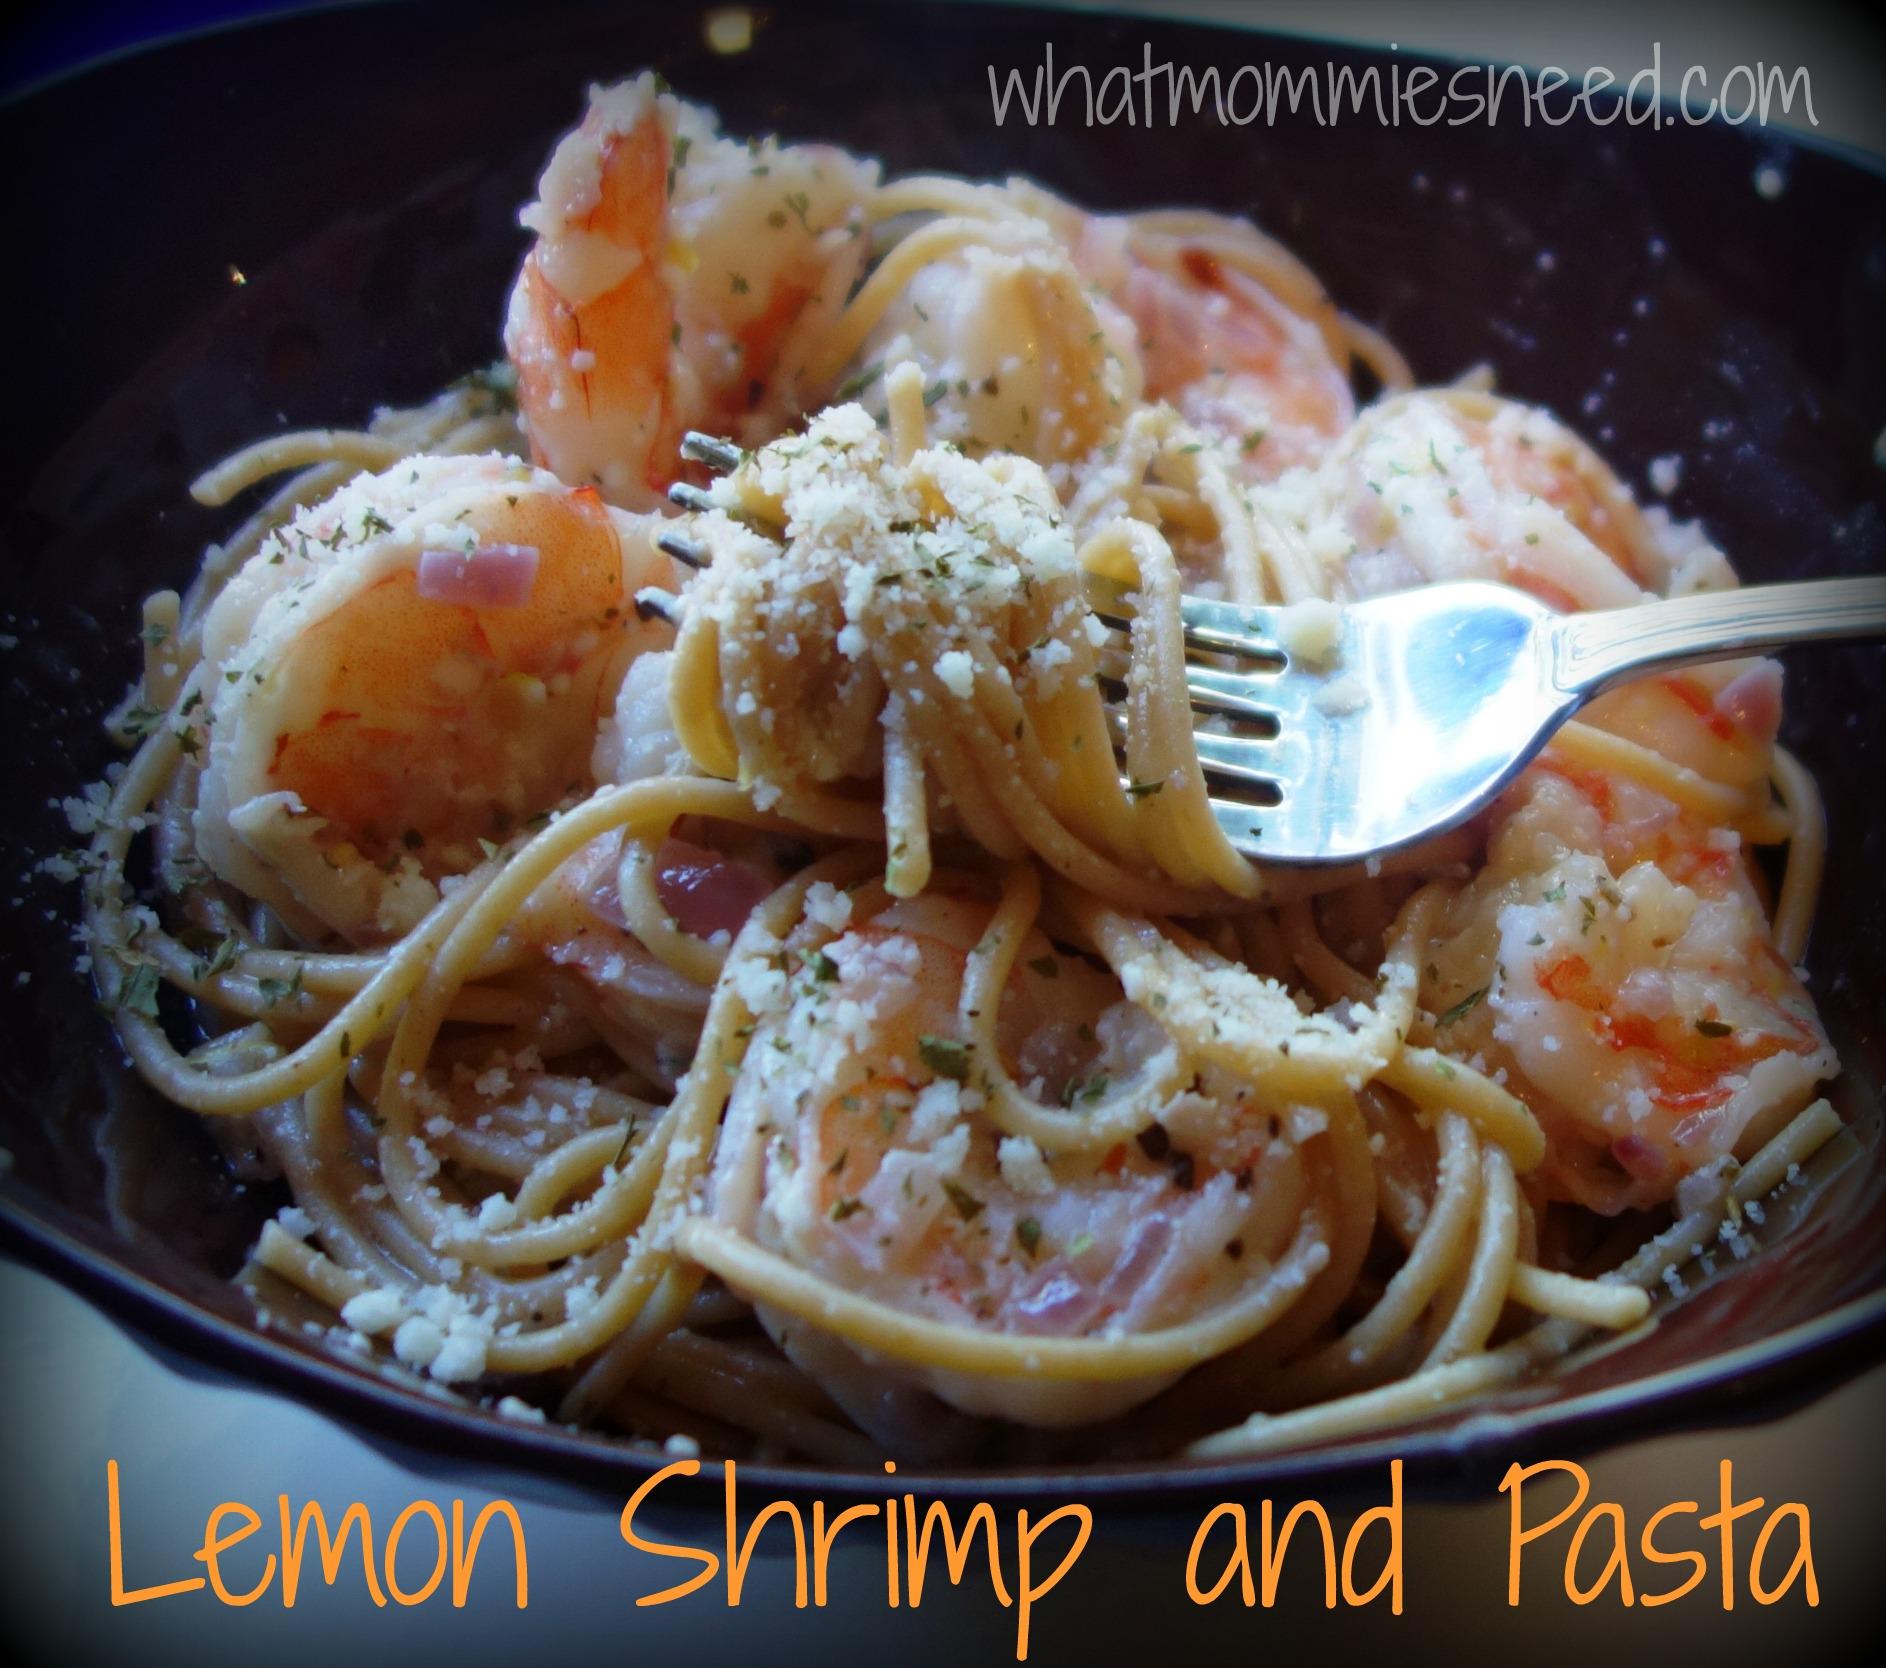 Lemon Shrimp and Pasta Recipe